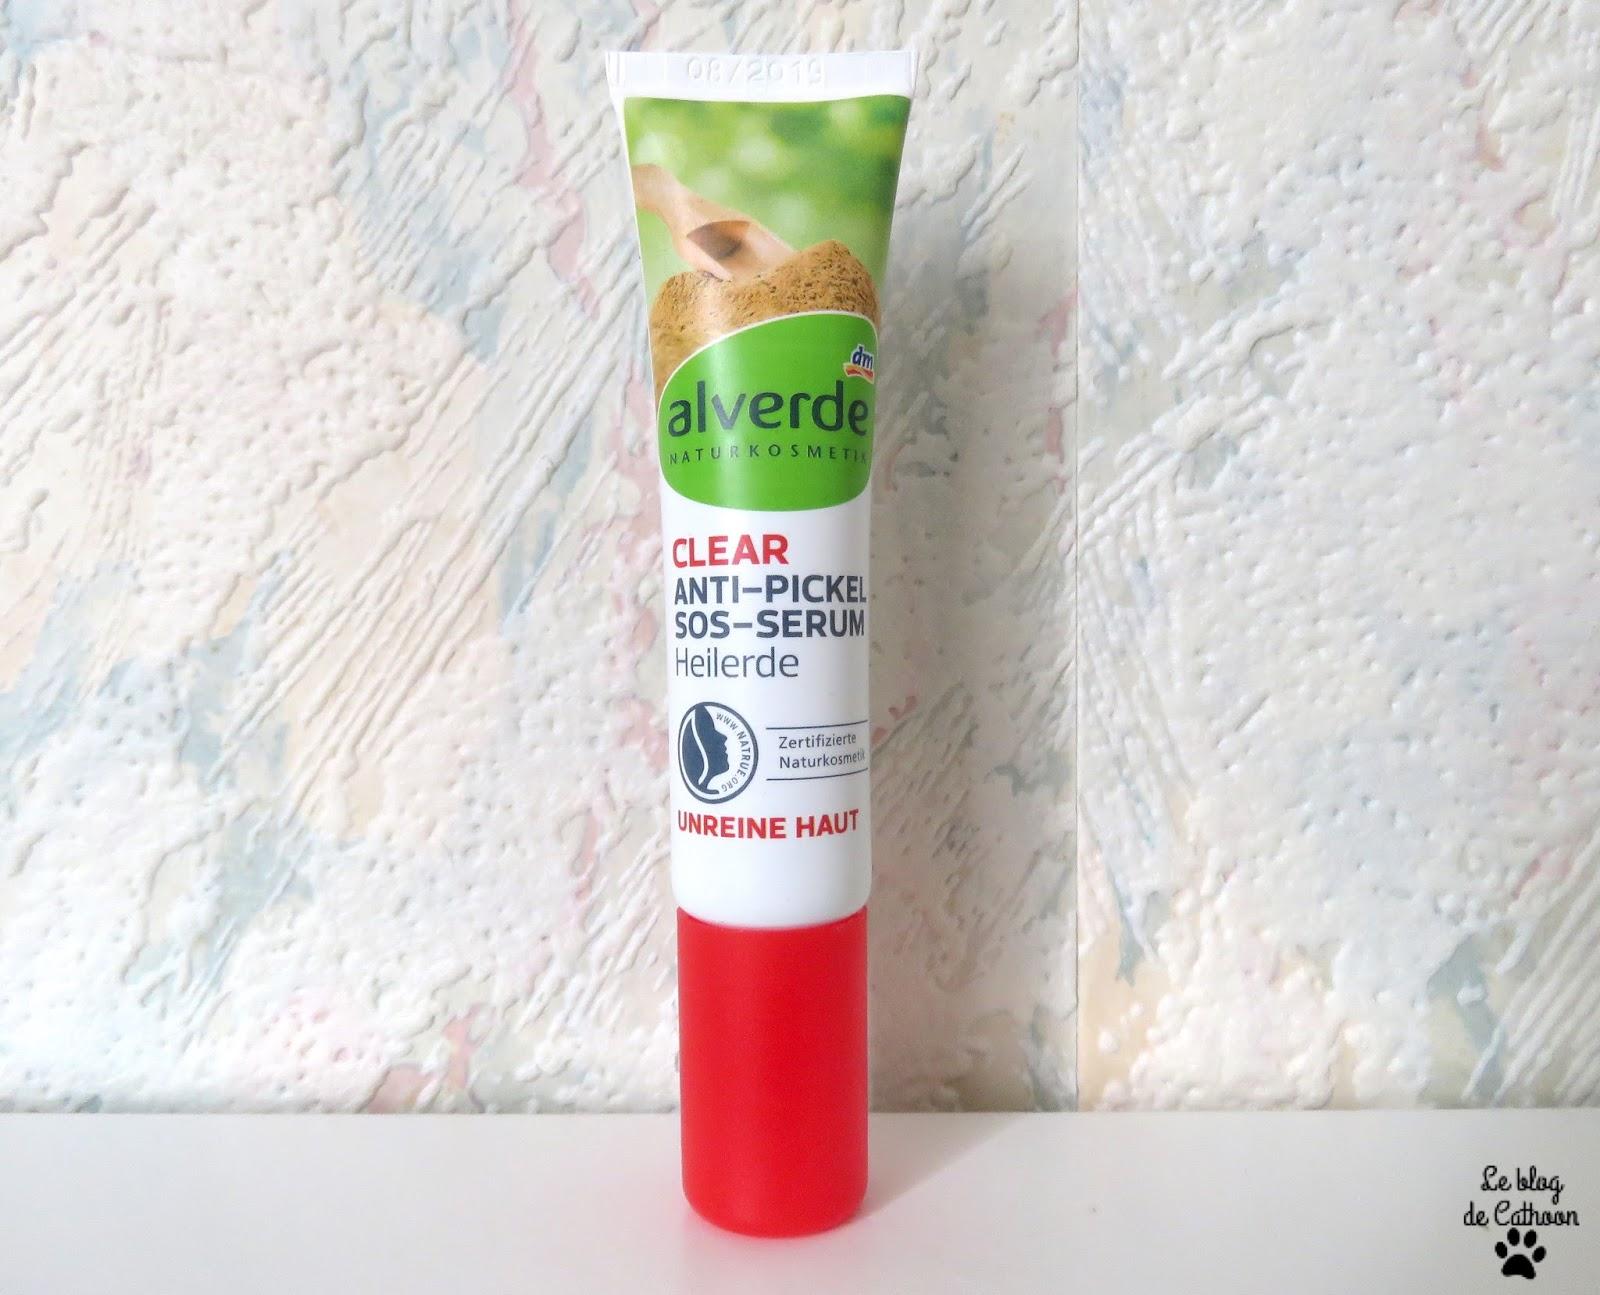 Clear Anti-Pickel SOS-Serum d'Alverde